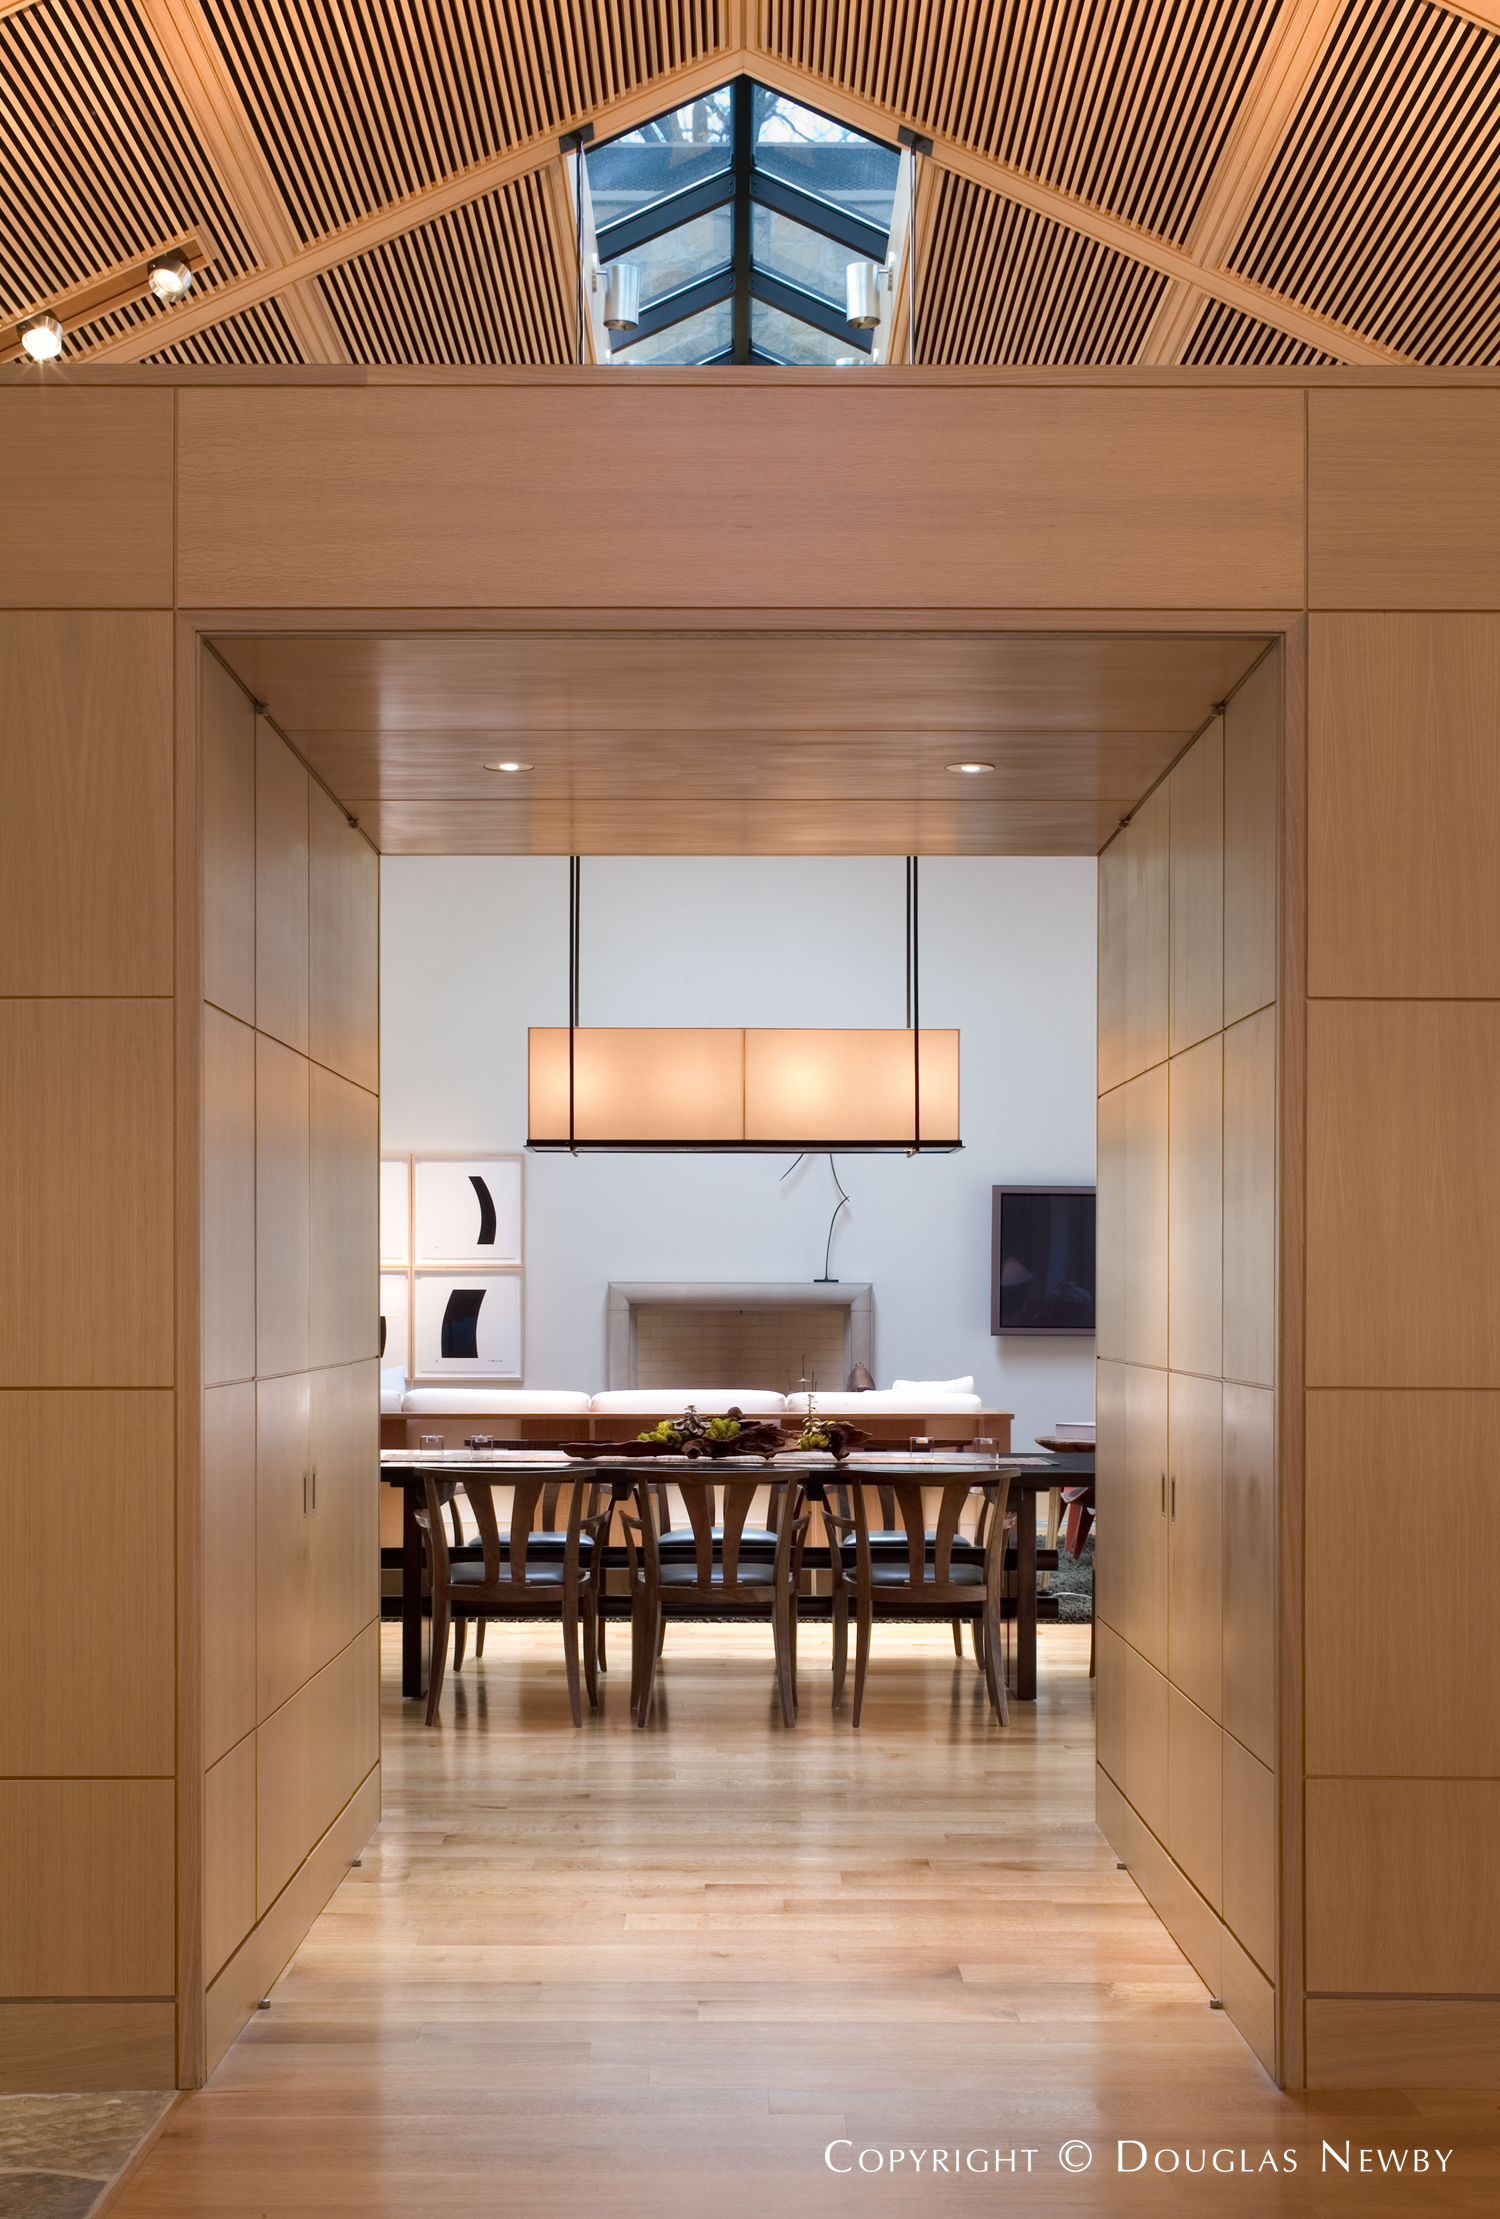 Entry by Paul Draper in Farquhar Home